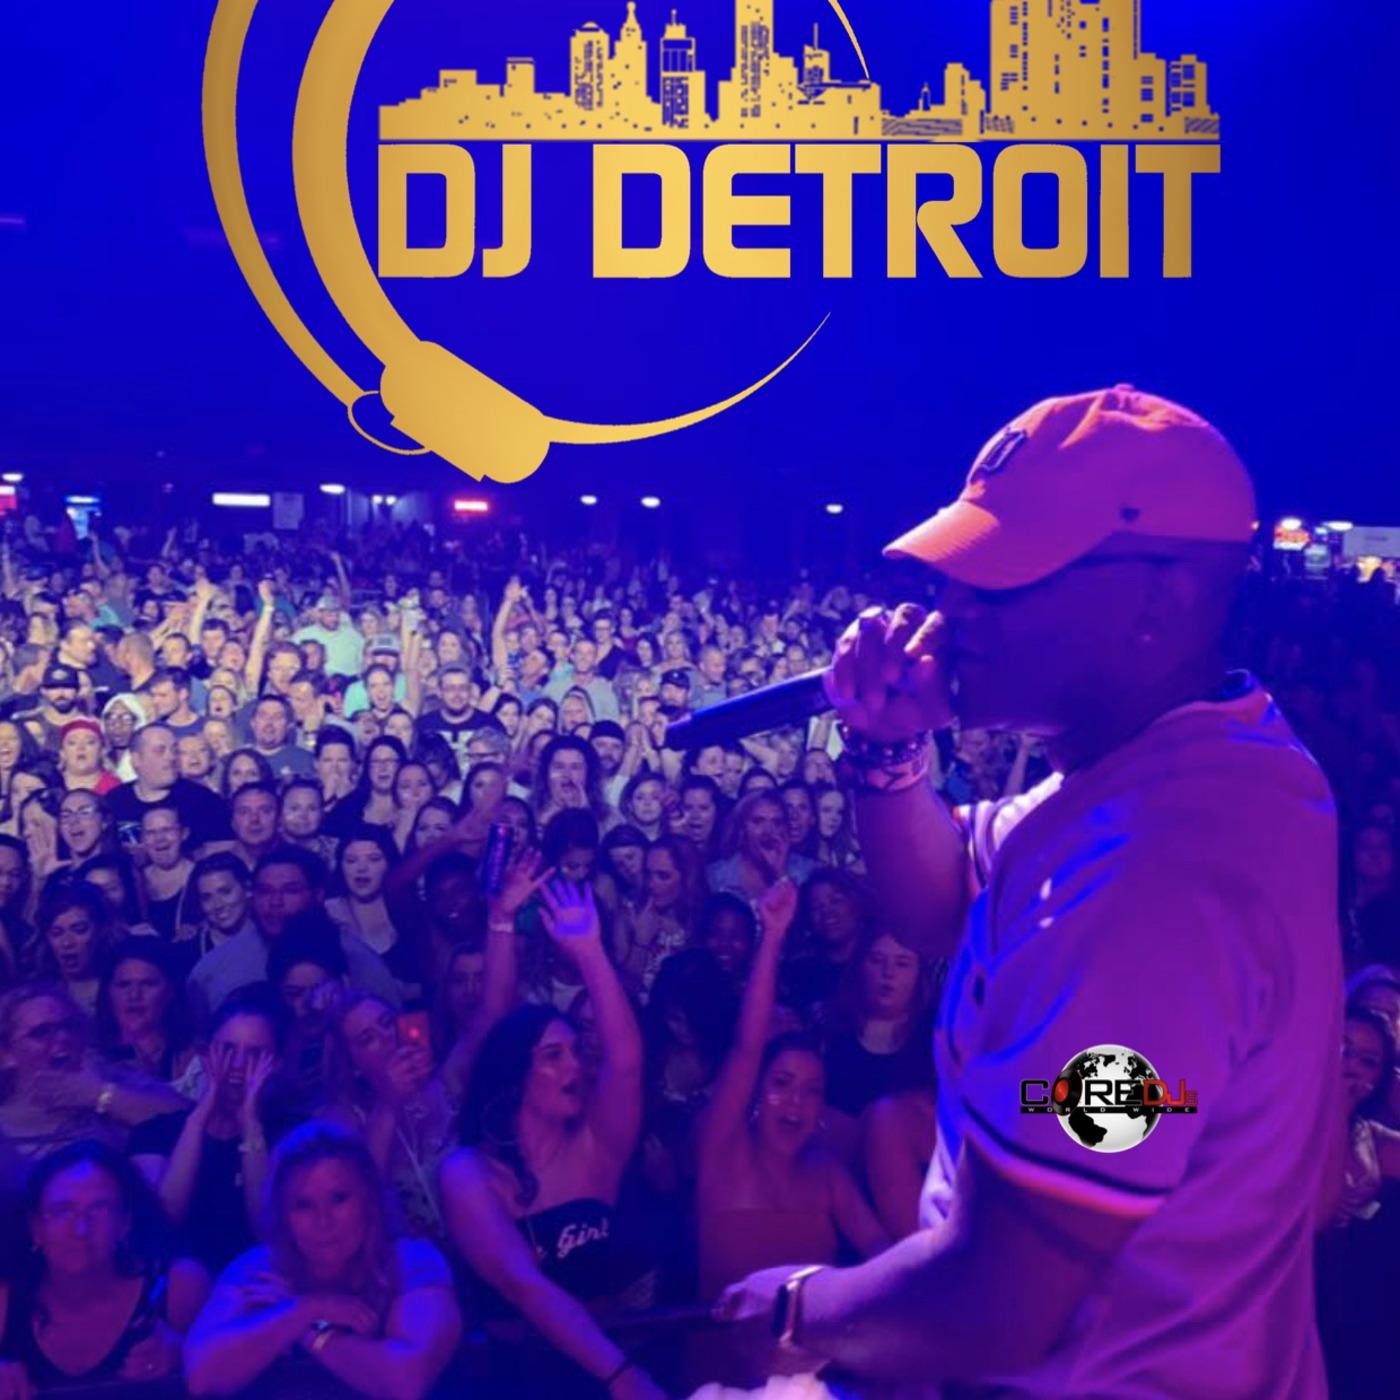 DJ Detroit Saturday Night House Party! DJ Detroit podcast